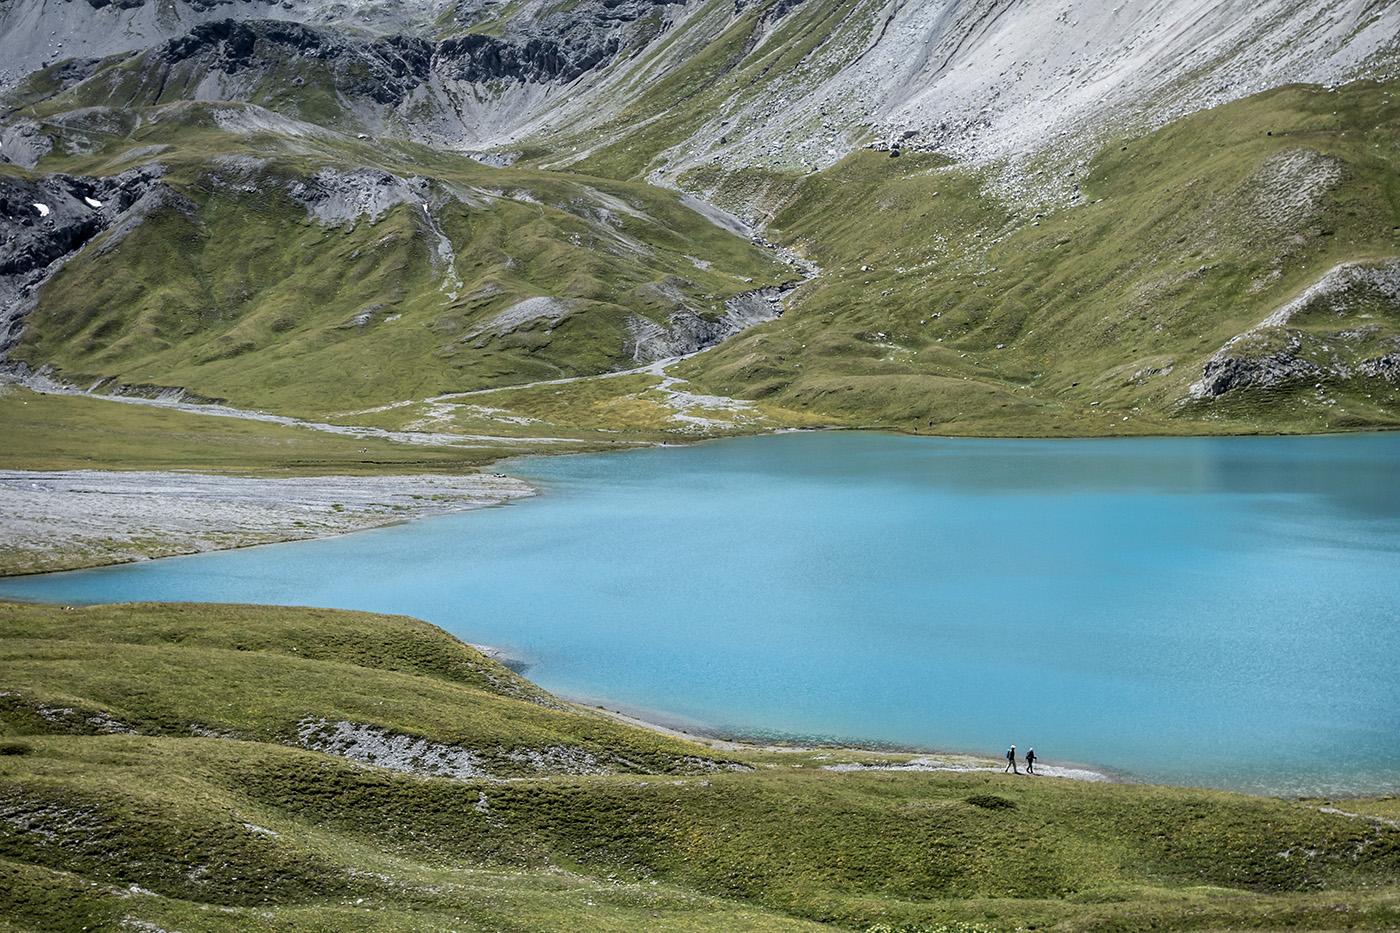 Wanderwoche Val Muestair, Lai da Rims, 12. - 19. Juli 2020 © Valerie Chetelat